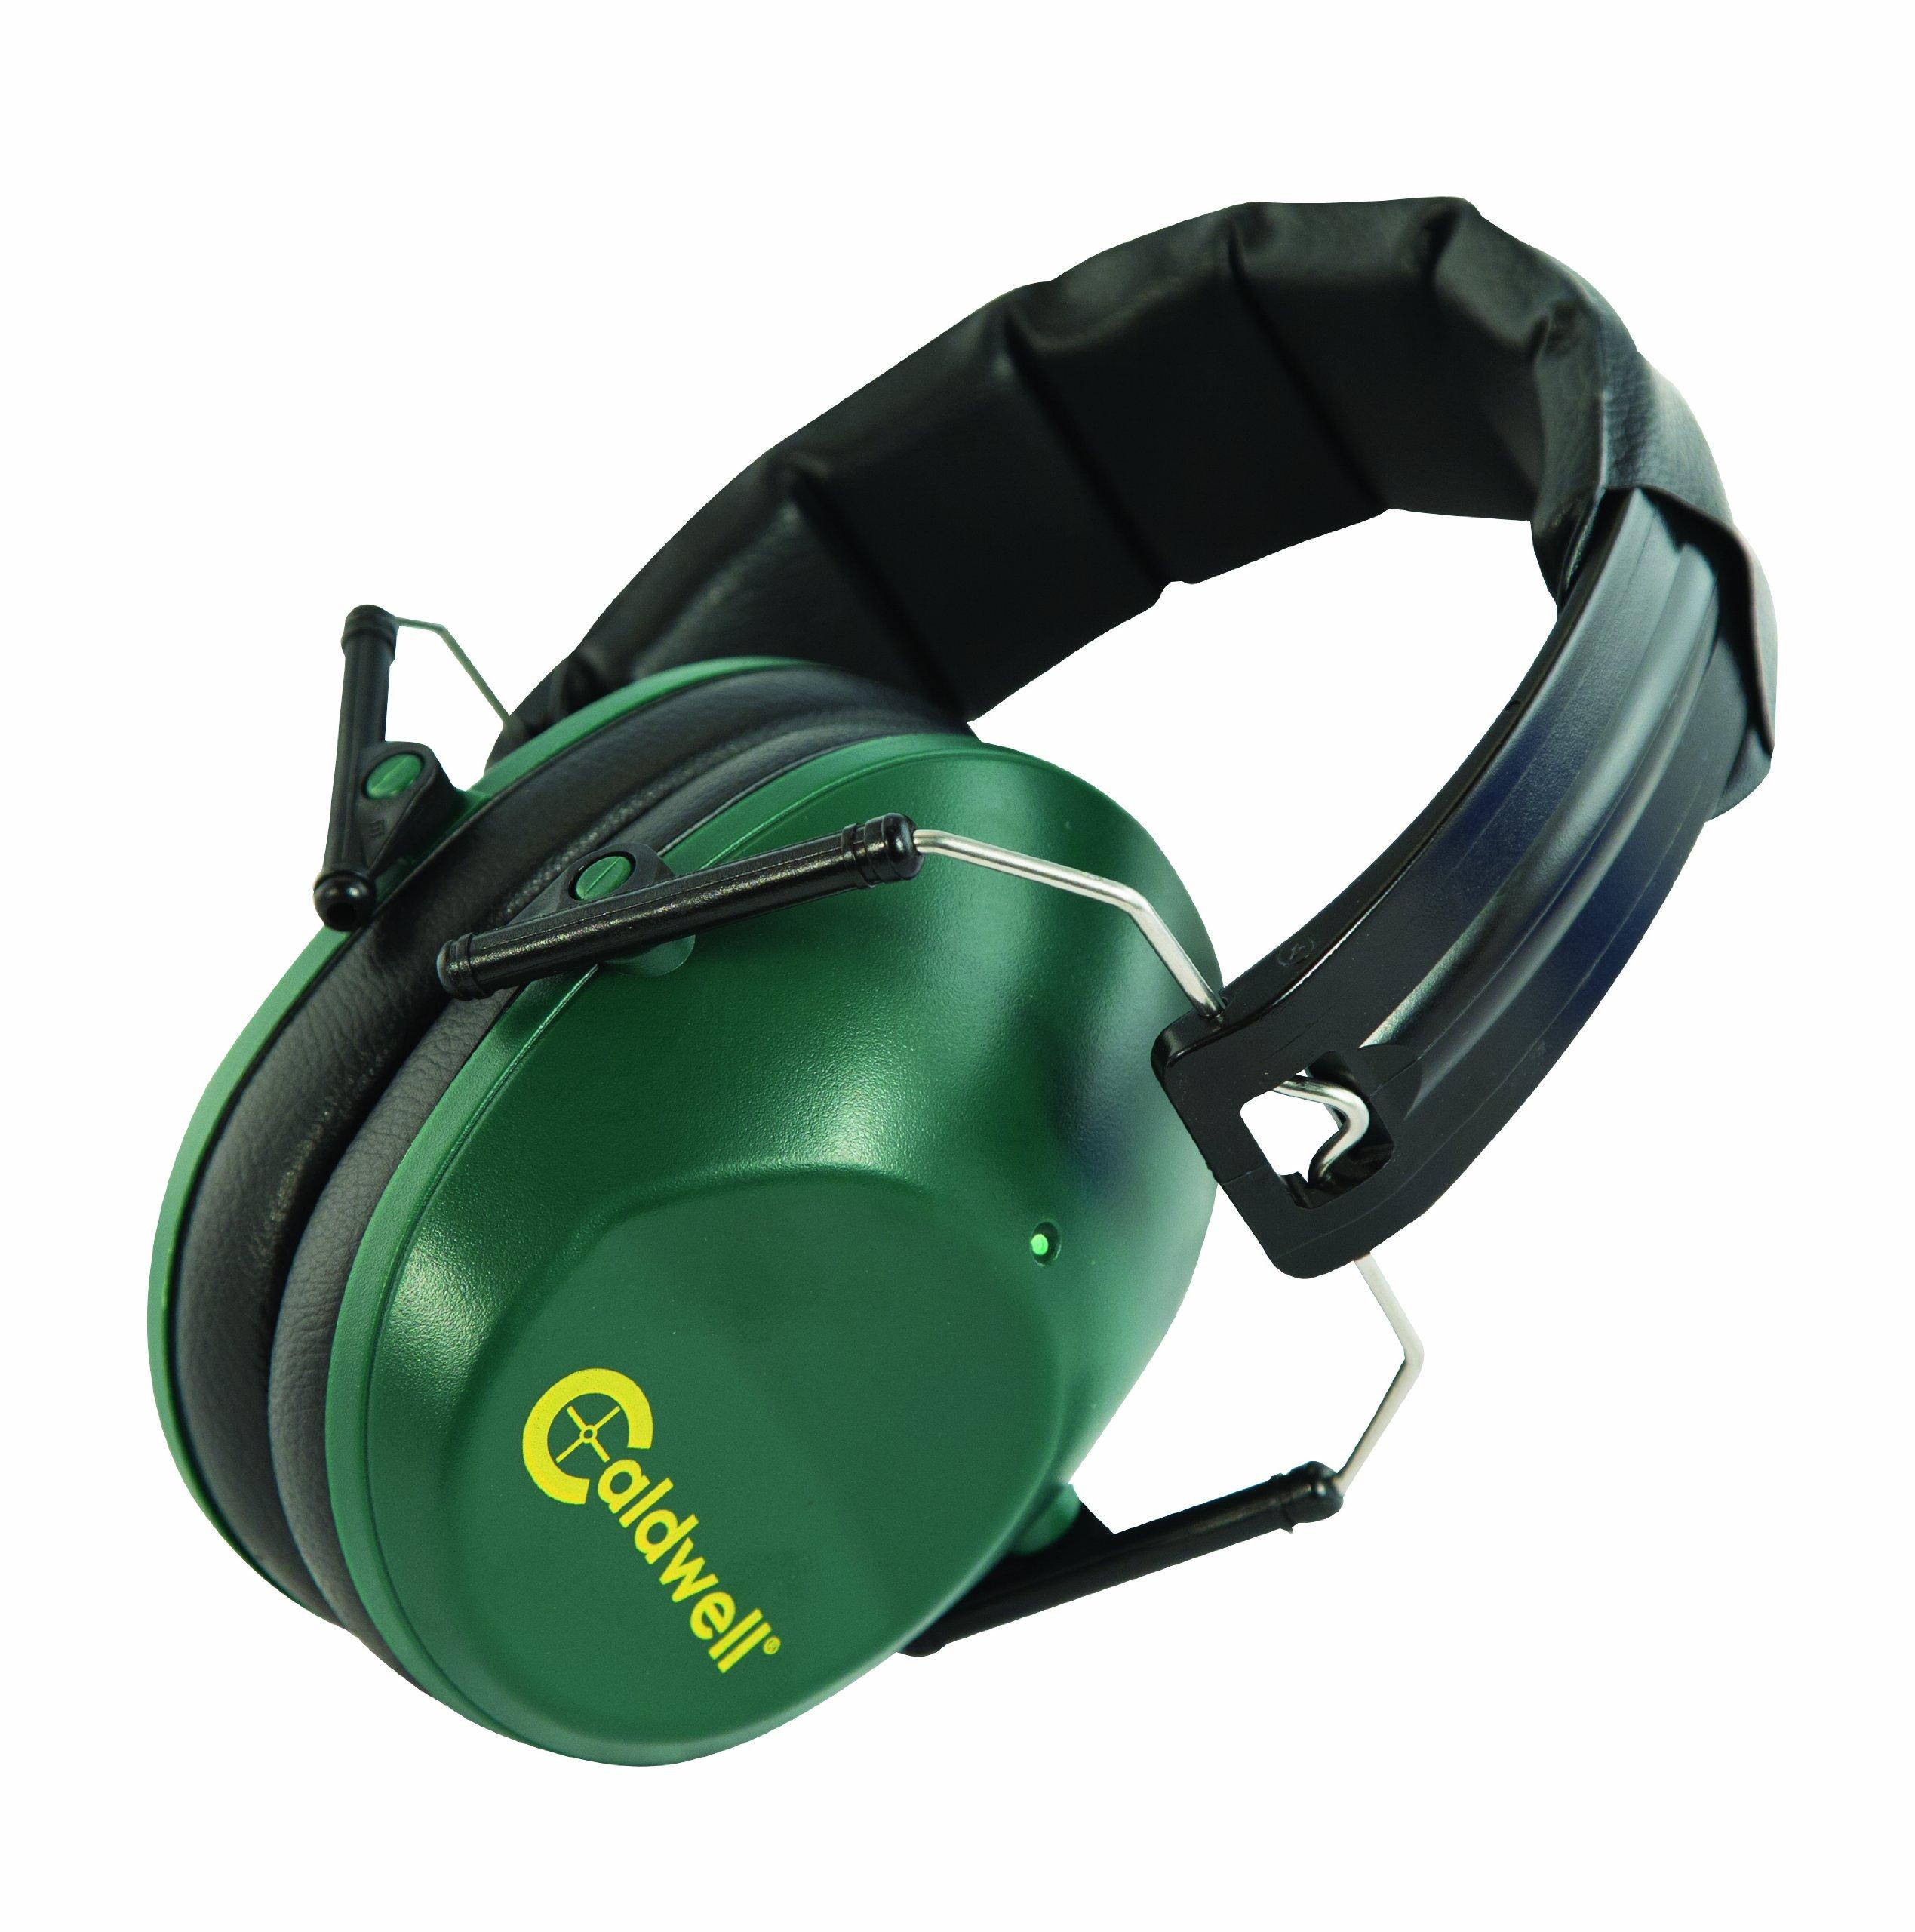 Caldwell Protection Lightweight Adjustable Earmuffs